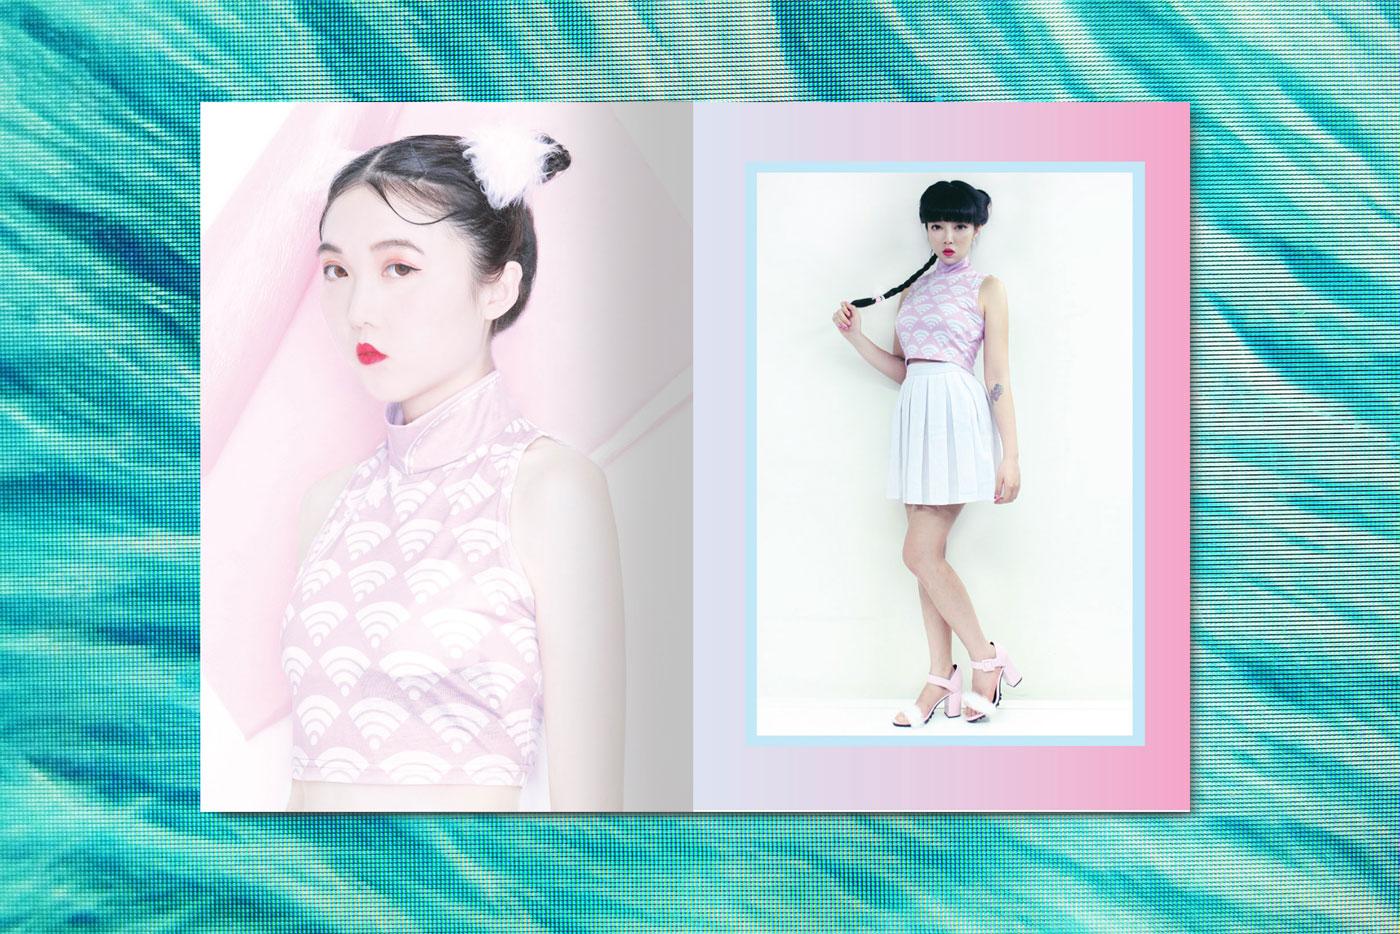 Ron Wan: WEEGIRLSCLUB featuring Ruby Gloom, Reni Kowk, Emeraldd, Mau Kai Chau, Elton 5wk, LeLe Cheung, and Koleman Chan